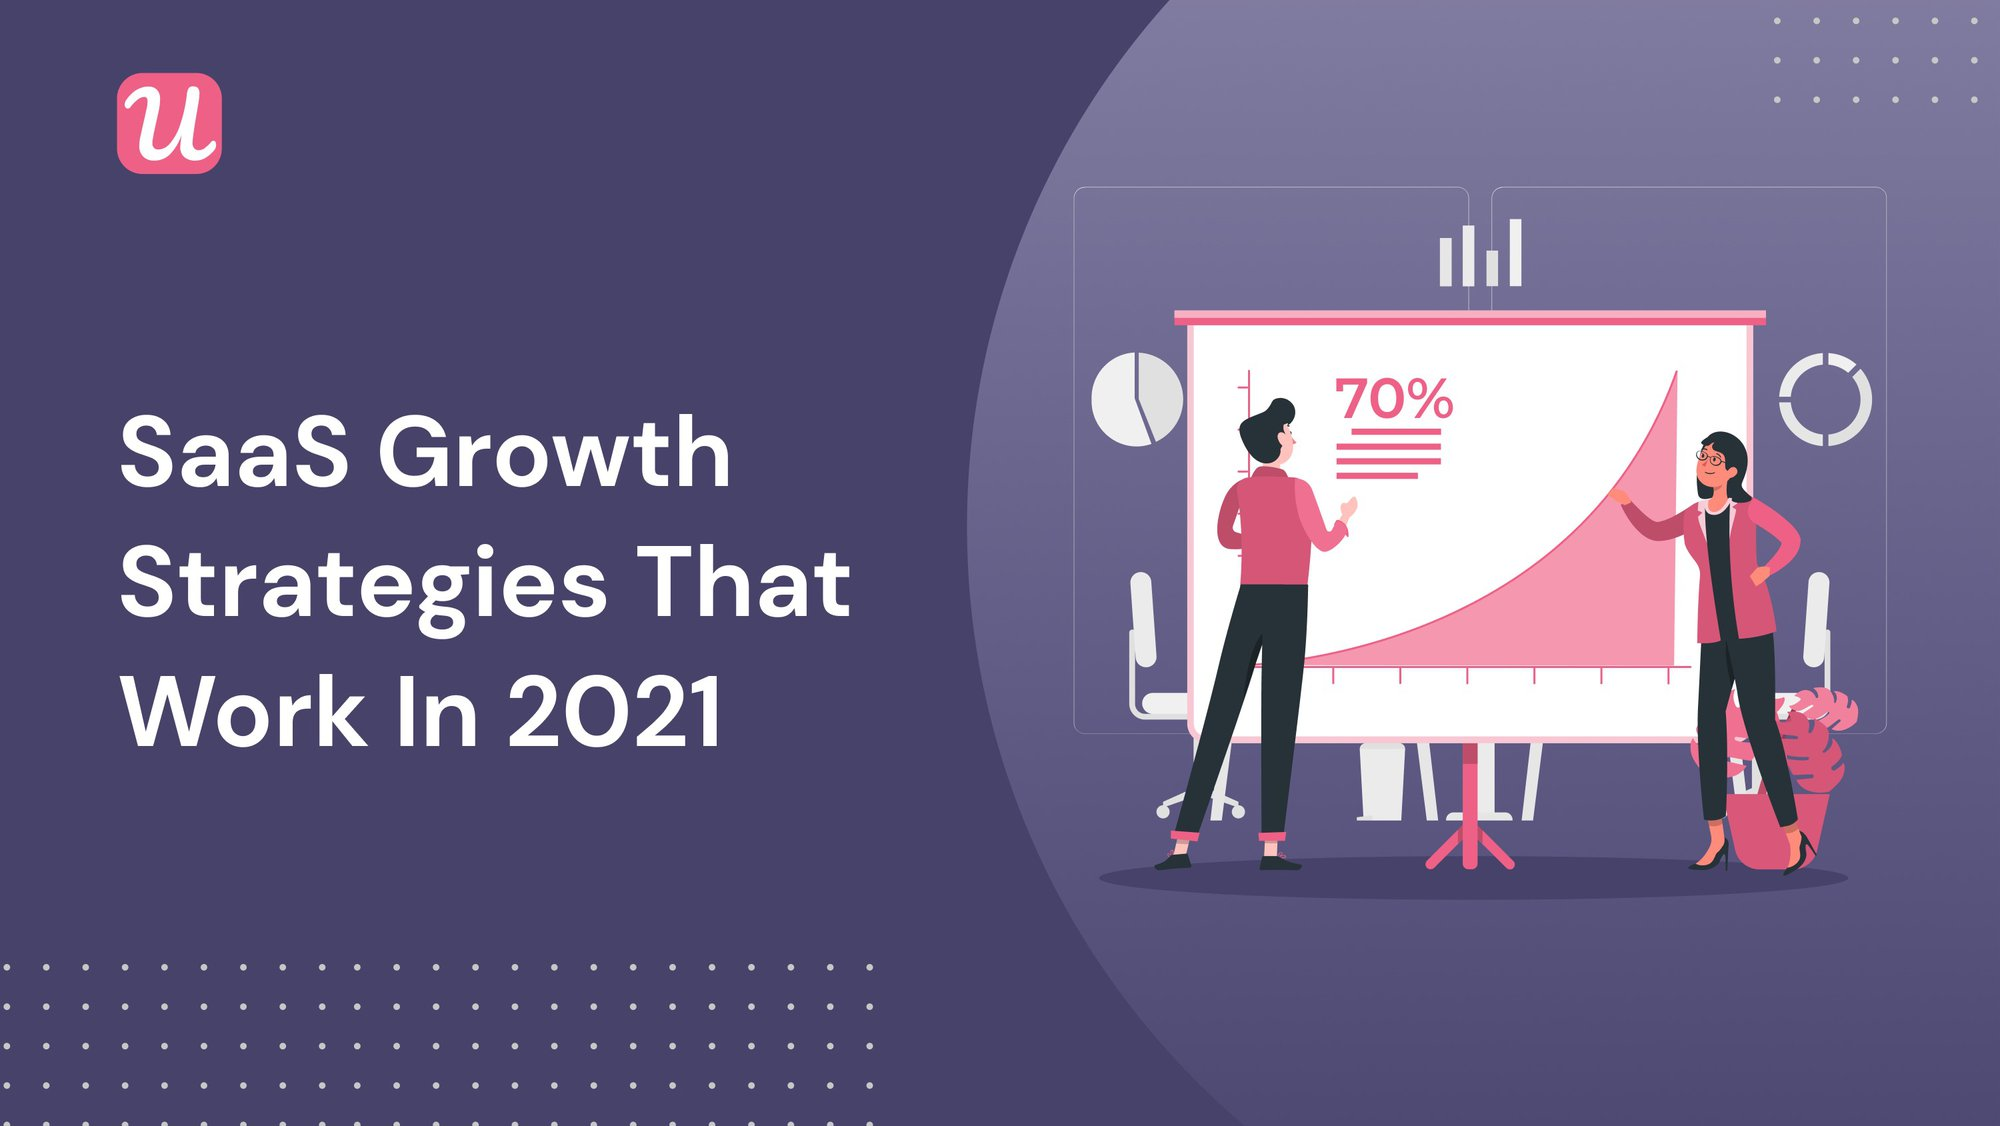 SaaS Growth Strategies That Work in 2021 -  with Aaron Krall, Sujan Patel and Natalie Luneva